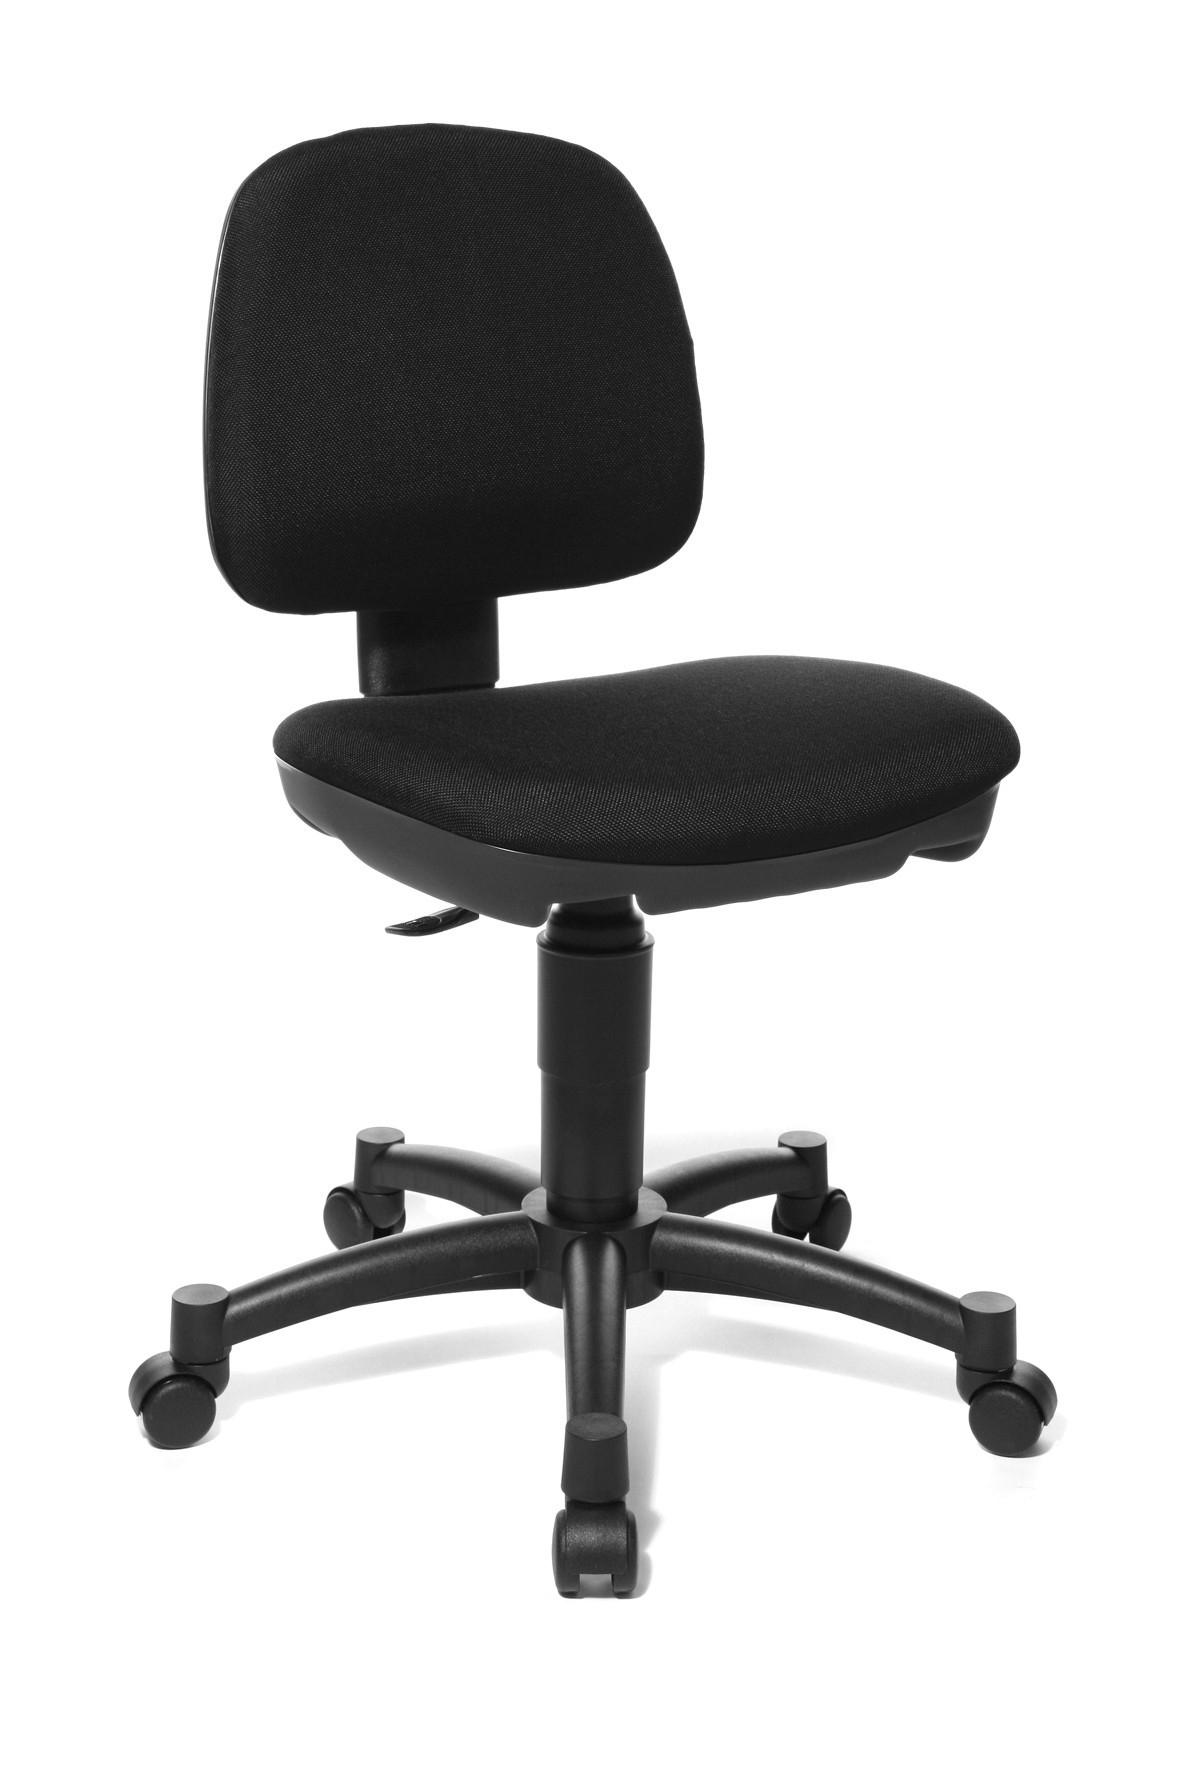 chaise roulante bureau